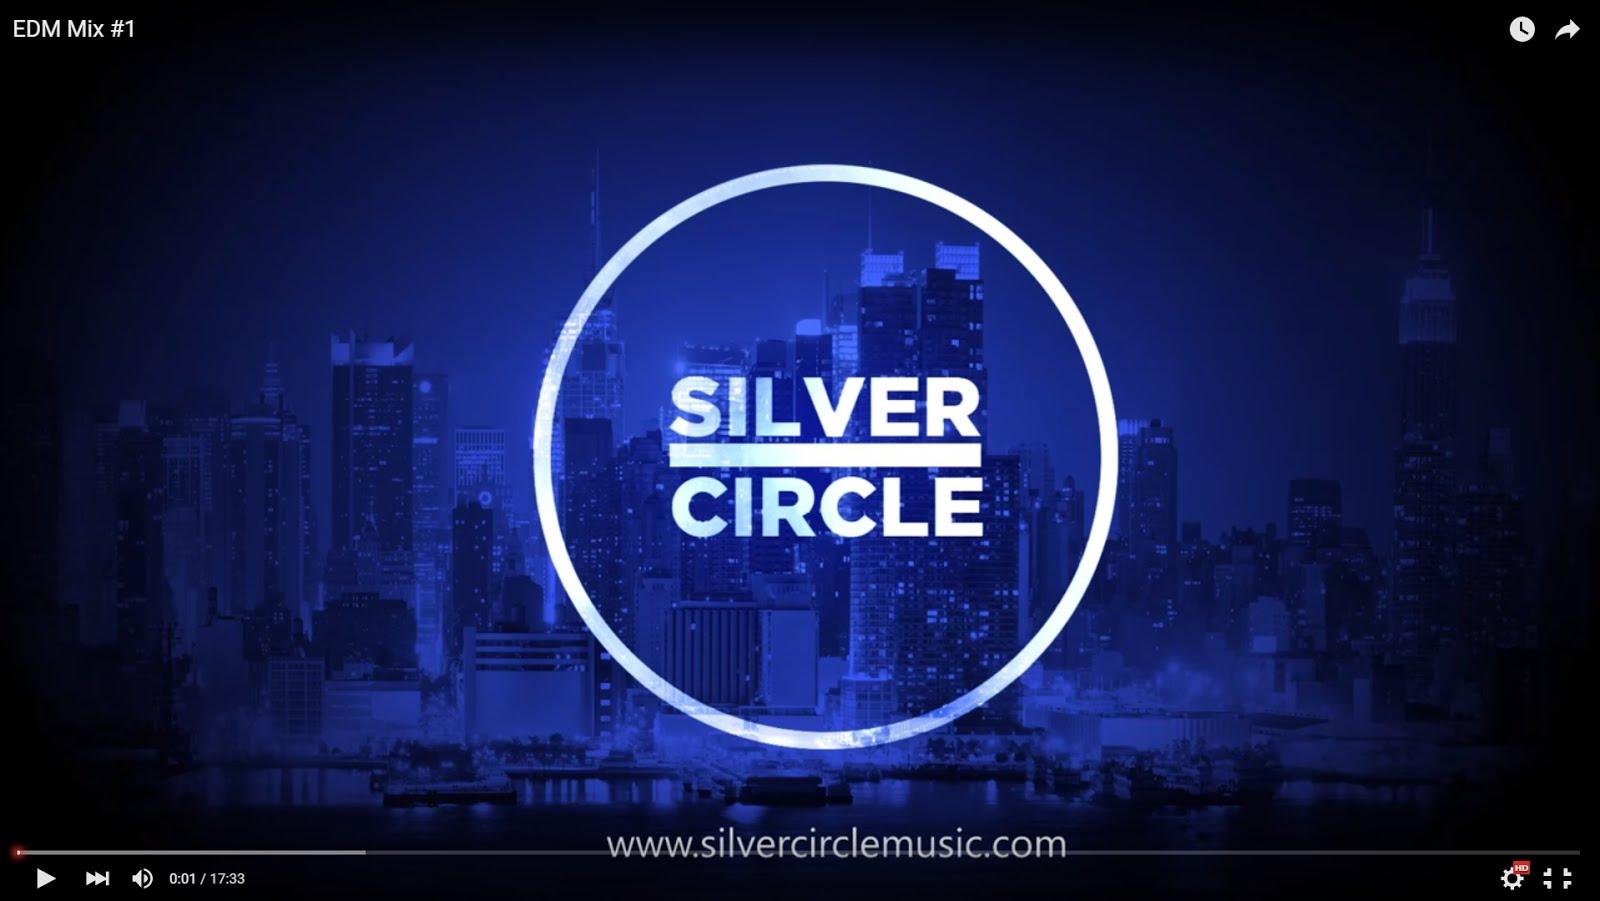 Silver Circle EDM Mix 1